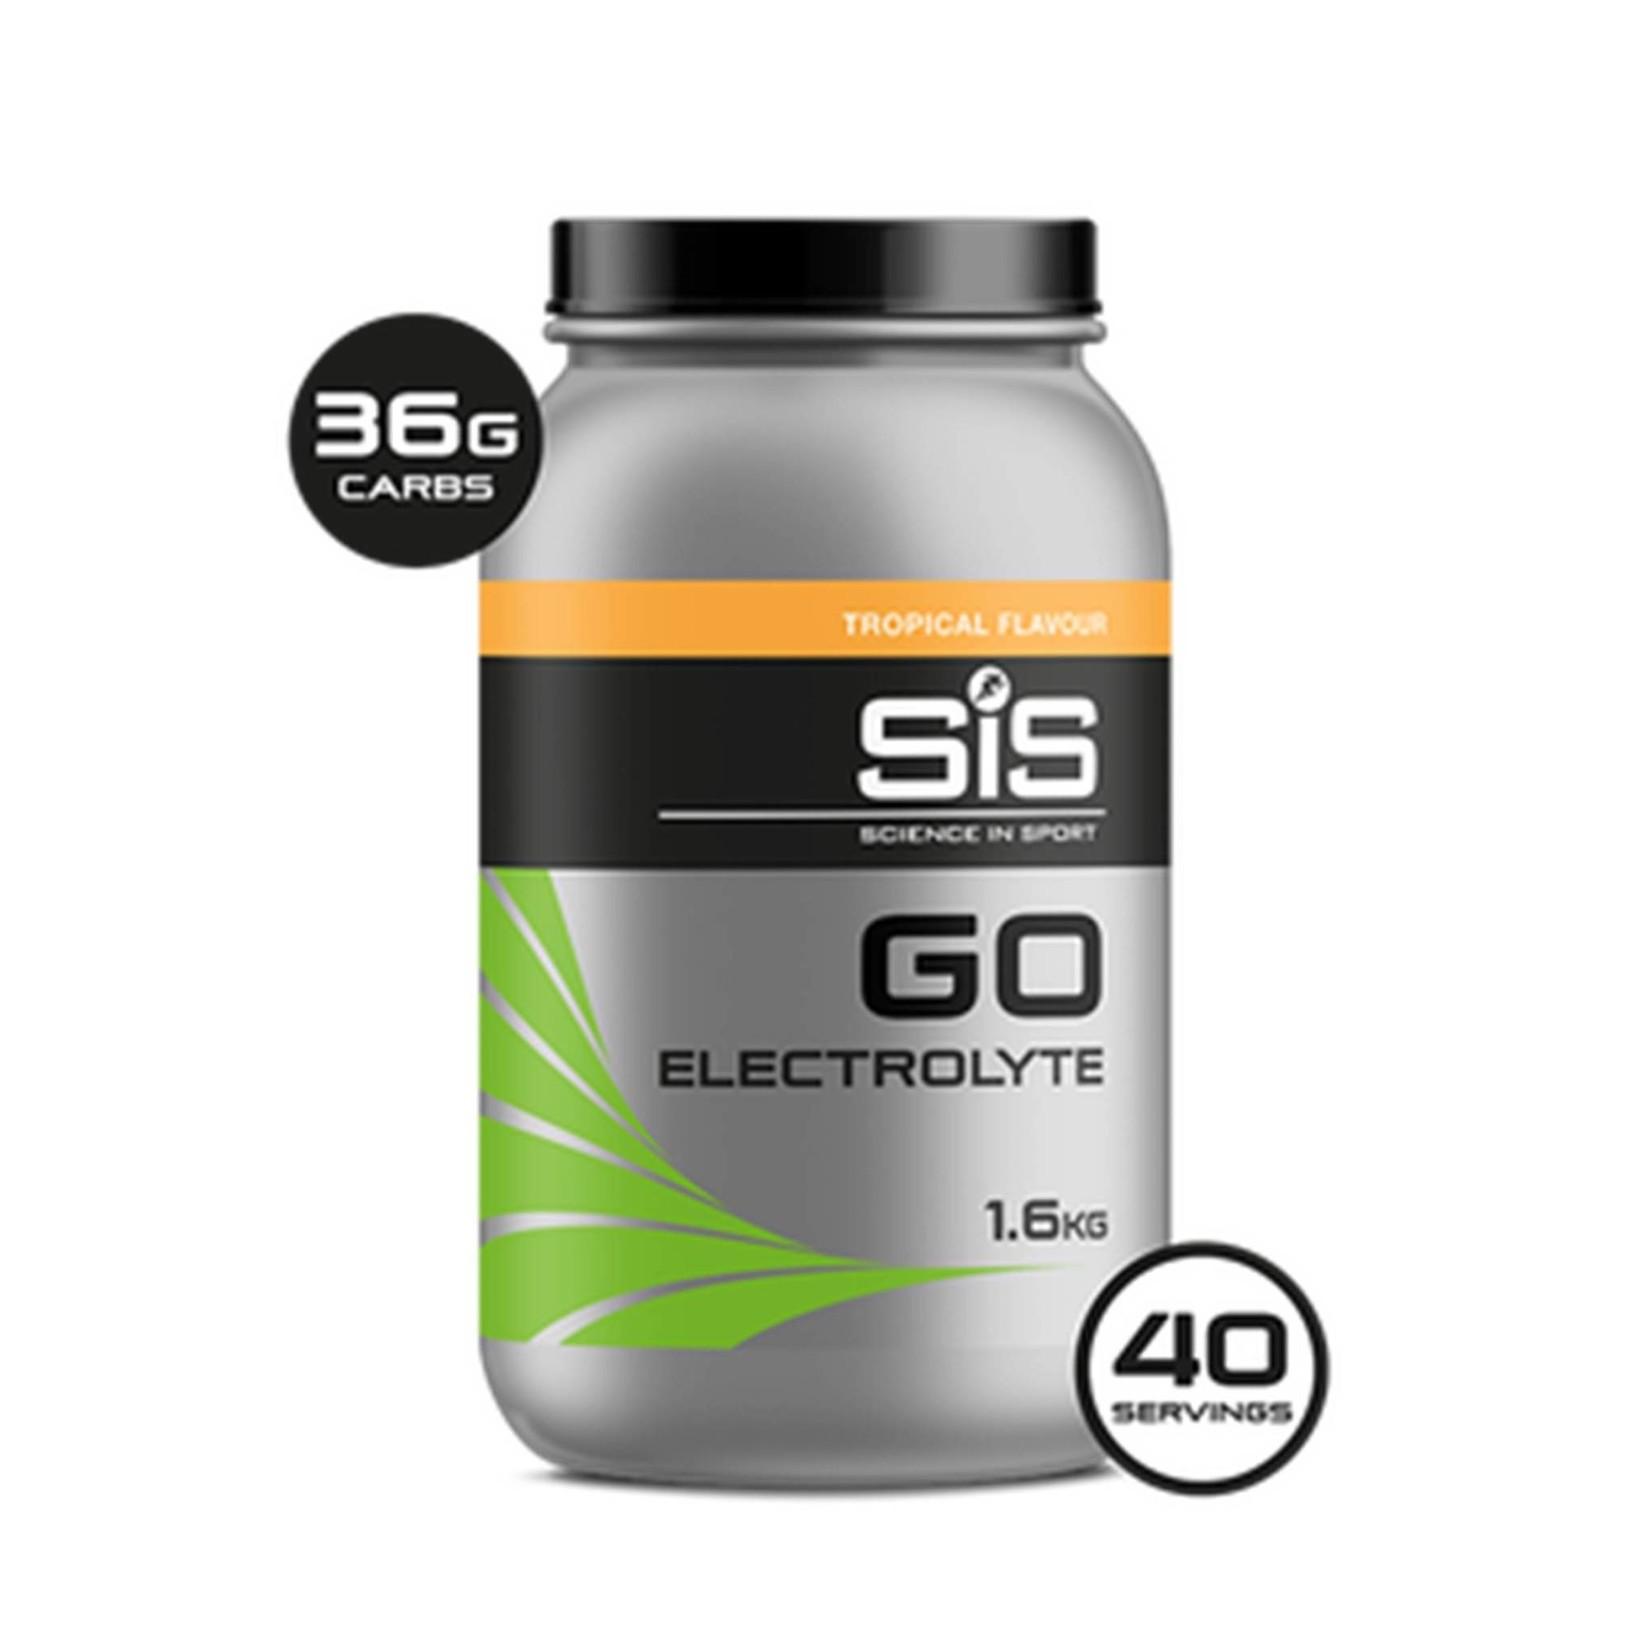 SIS SIS Go Electrolyte Sports Fuel 1.6kg Tropical